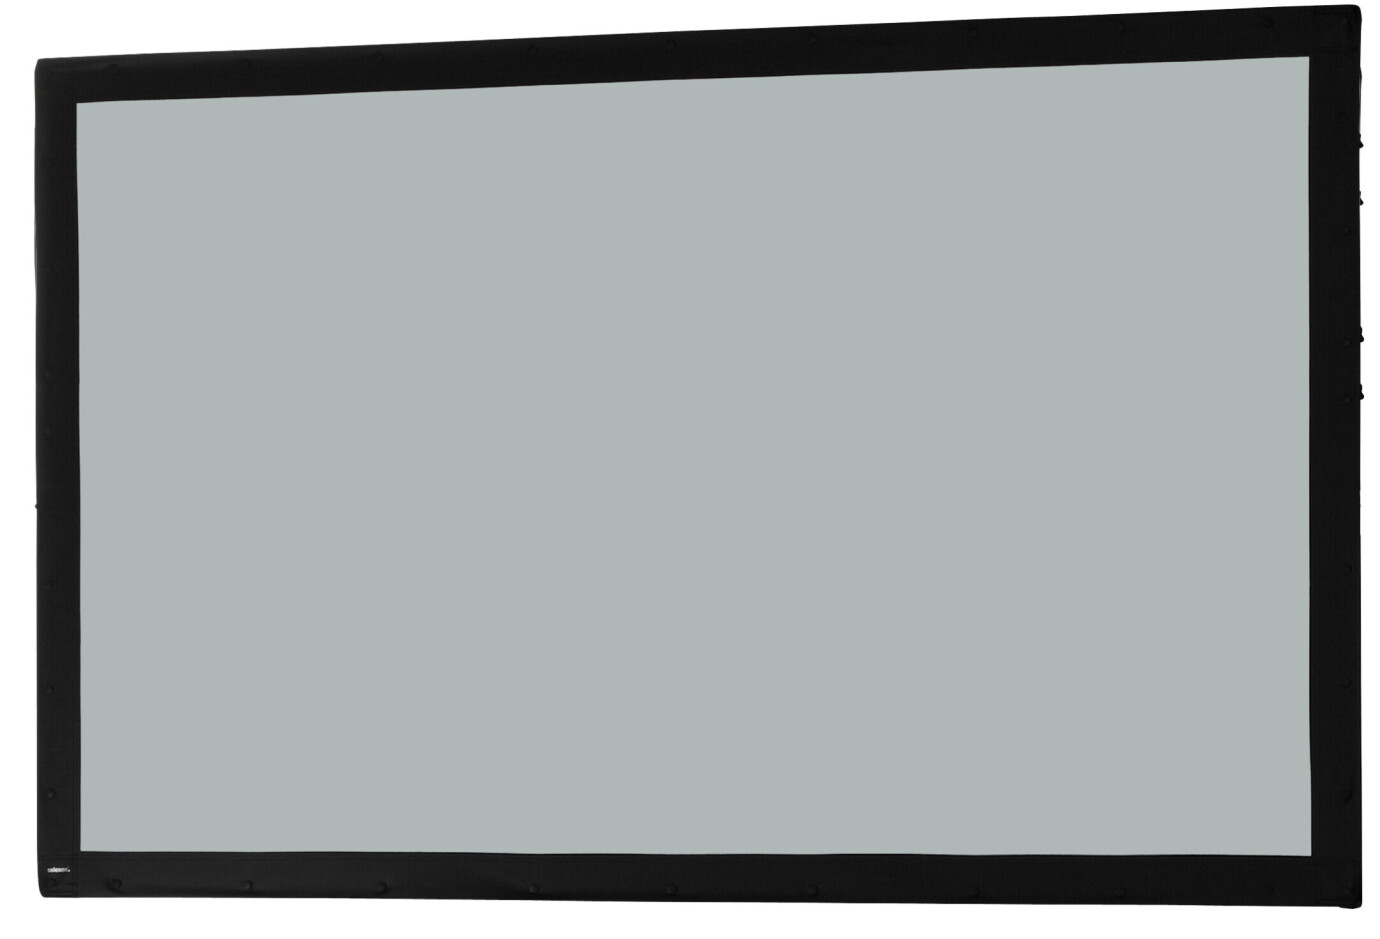 celexon Tuch für Faltrahmen Mobil Expert - 366 x 229 cm Rückprojektion